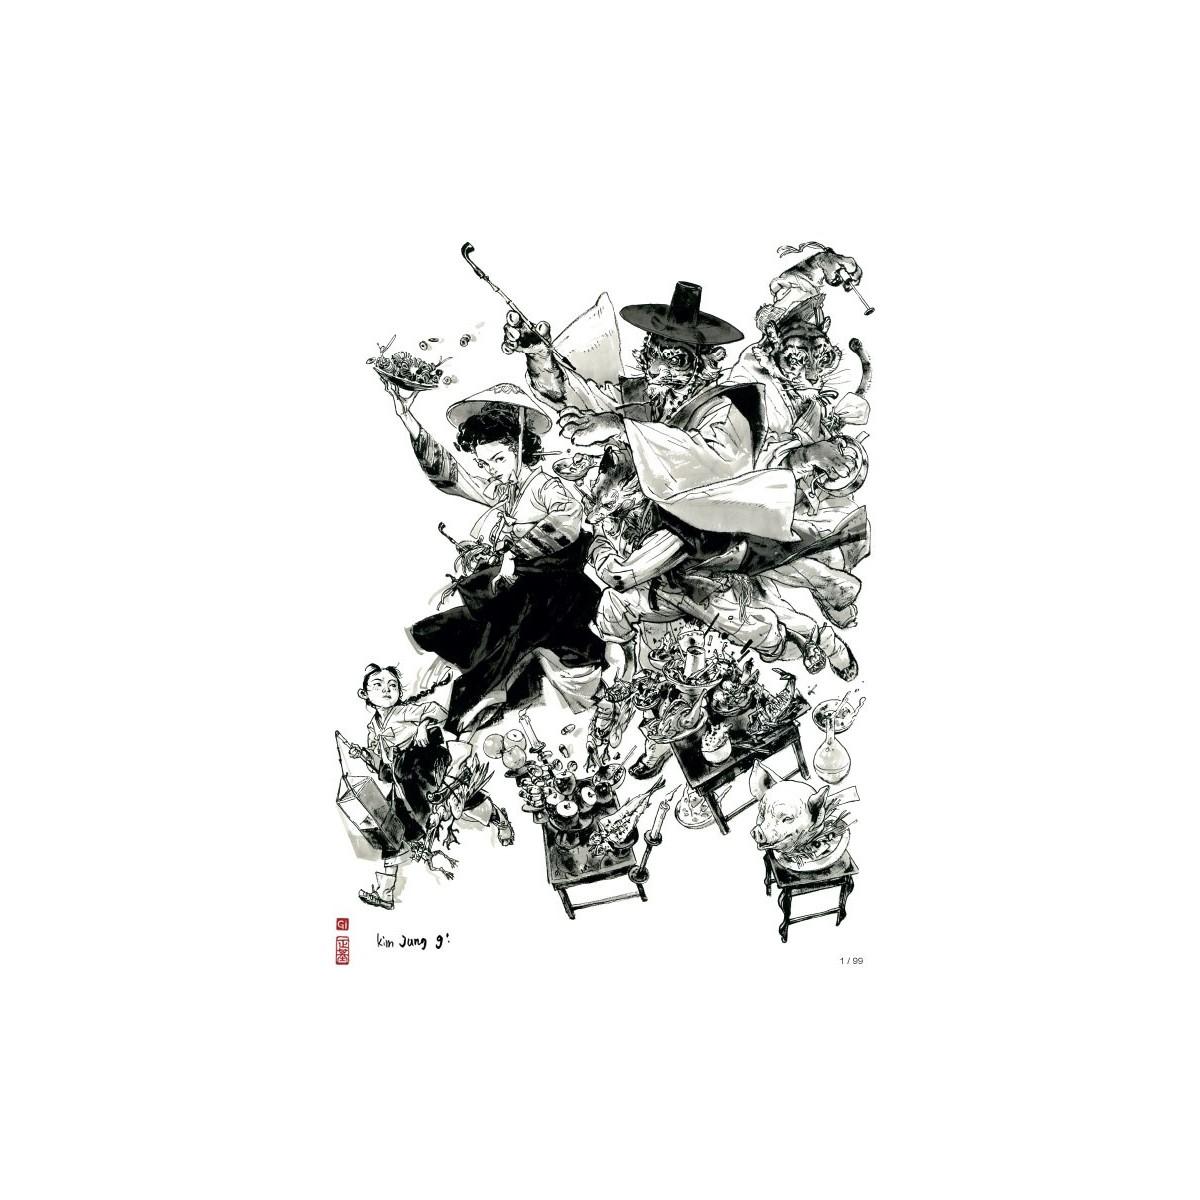 Kim Jung Gi - 'Bon appétit' print - 30 x 40 cm - Signed & Numbered (99 ex.)